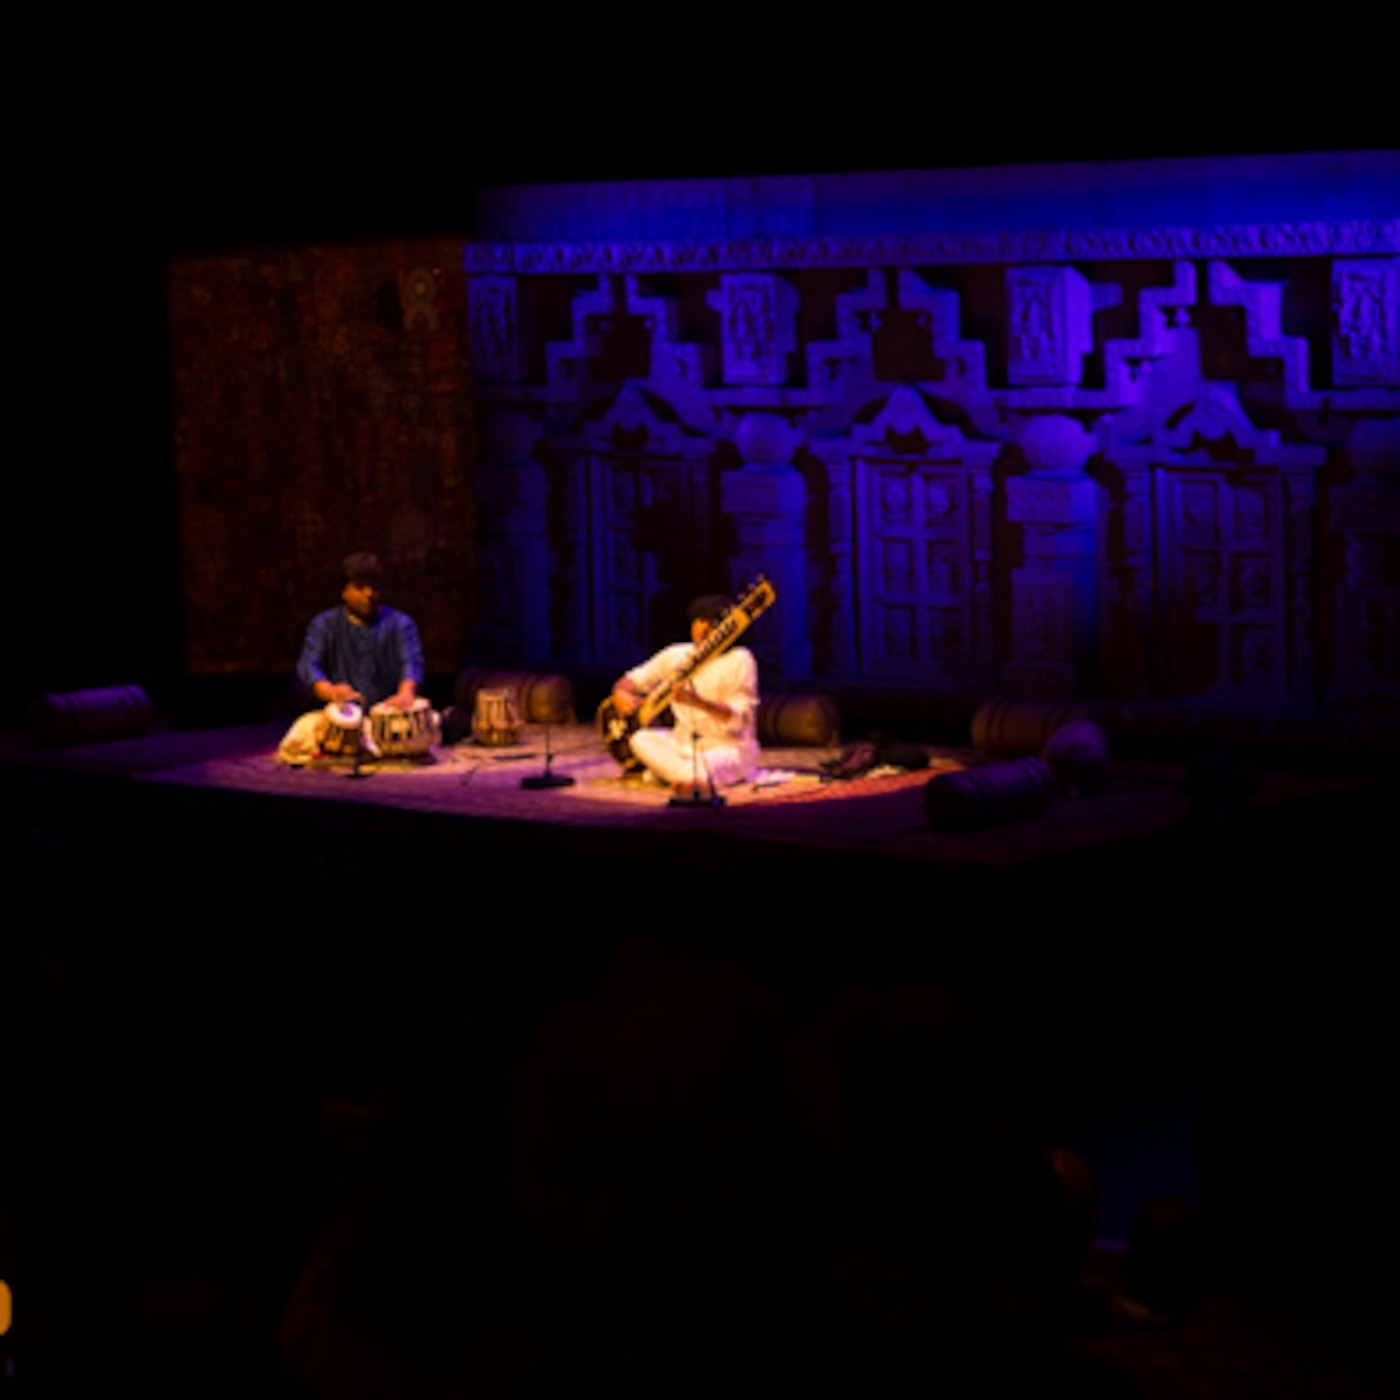 Darbar Festival - Shashank Subramanyam and Niladri Kumar